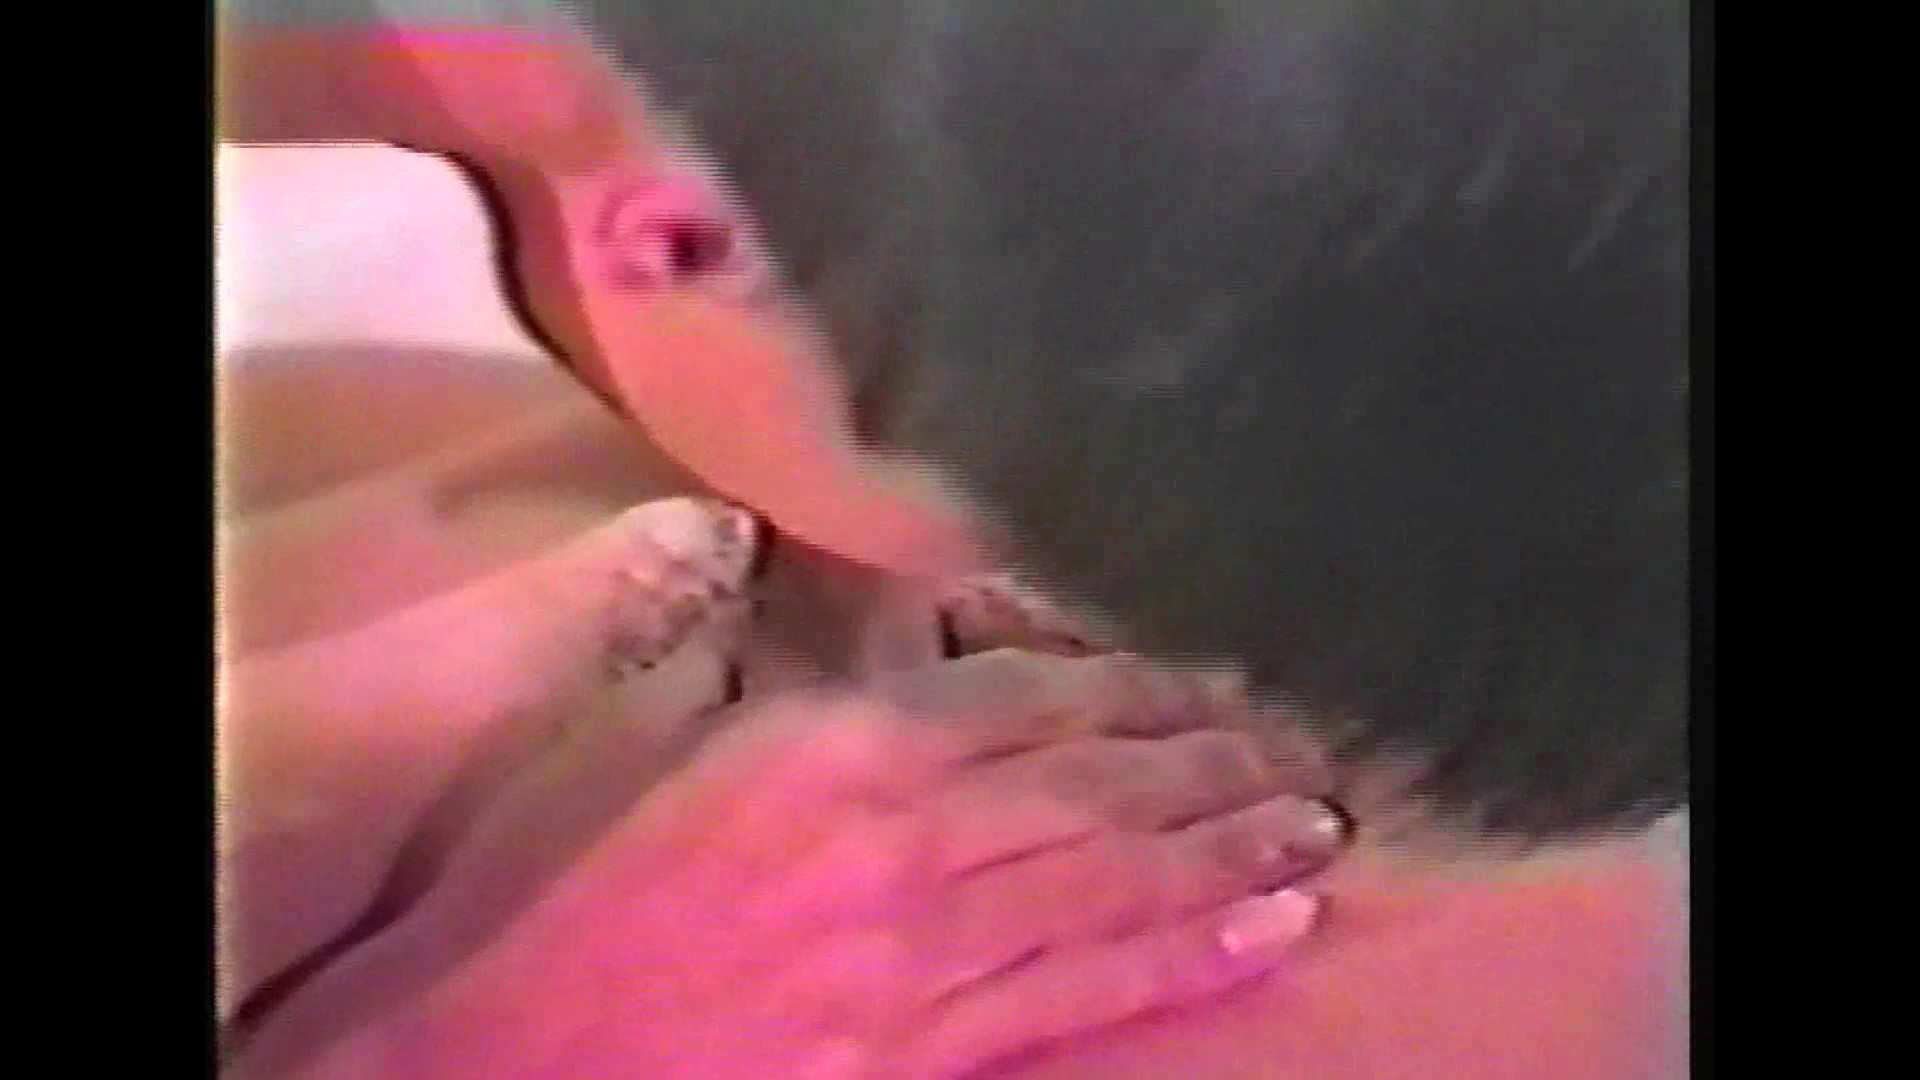 GAYBOY宏のオカズ倉庫Vol.9-1 ノンケ達のセックス ゲイエロ動画紹介 72画像 34